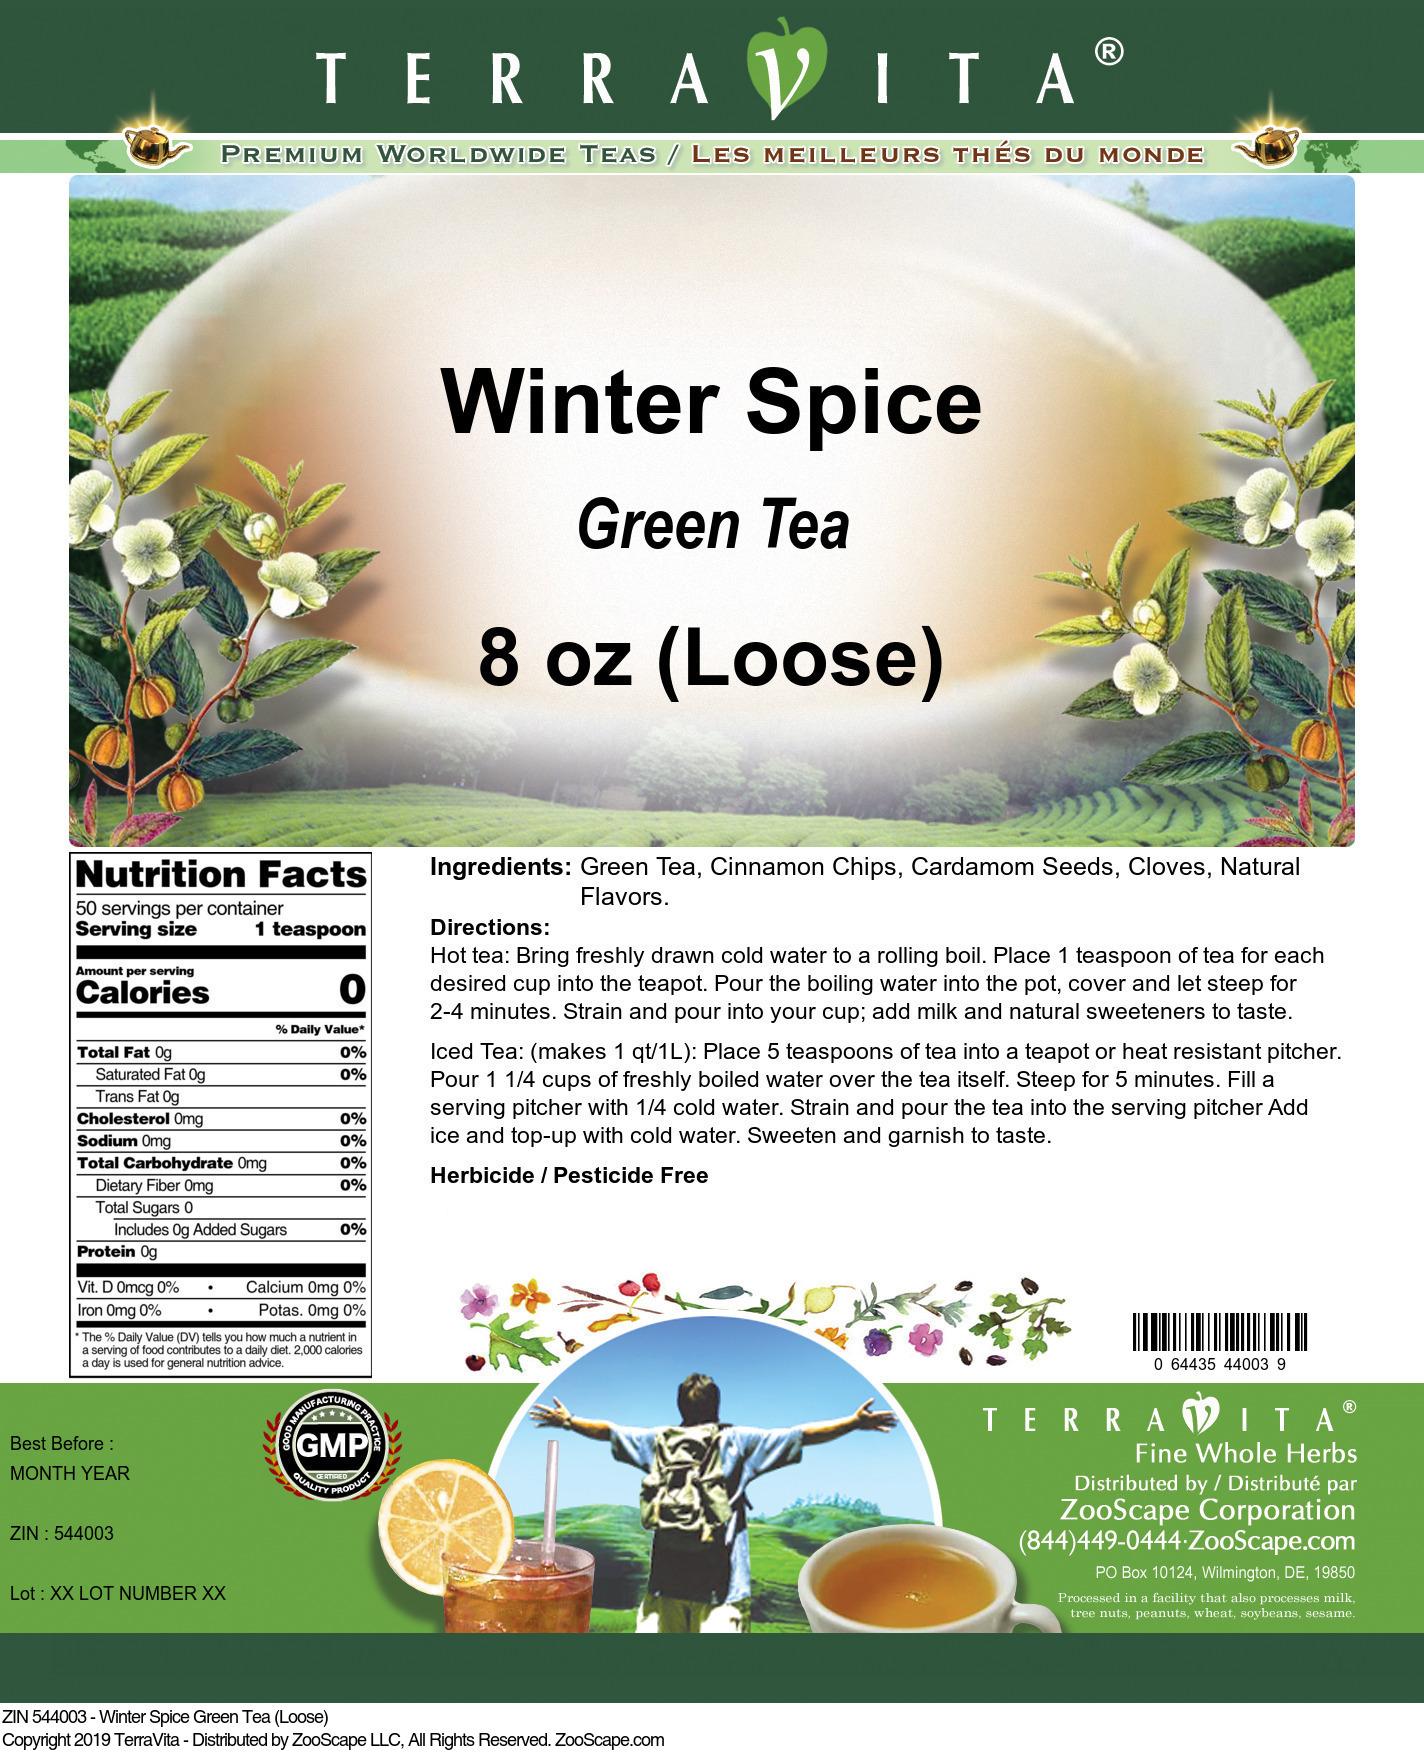 Winter Spice Green Tea